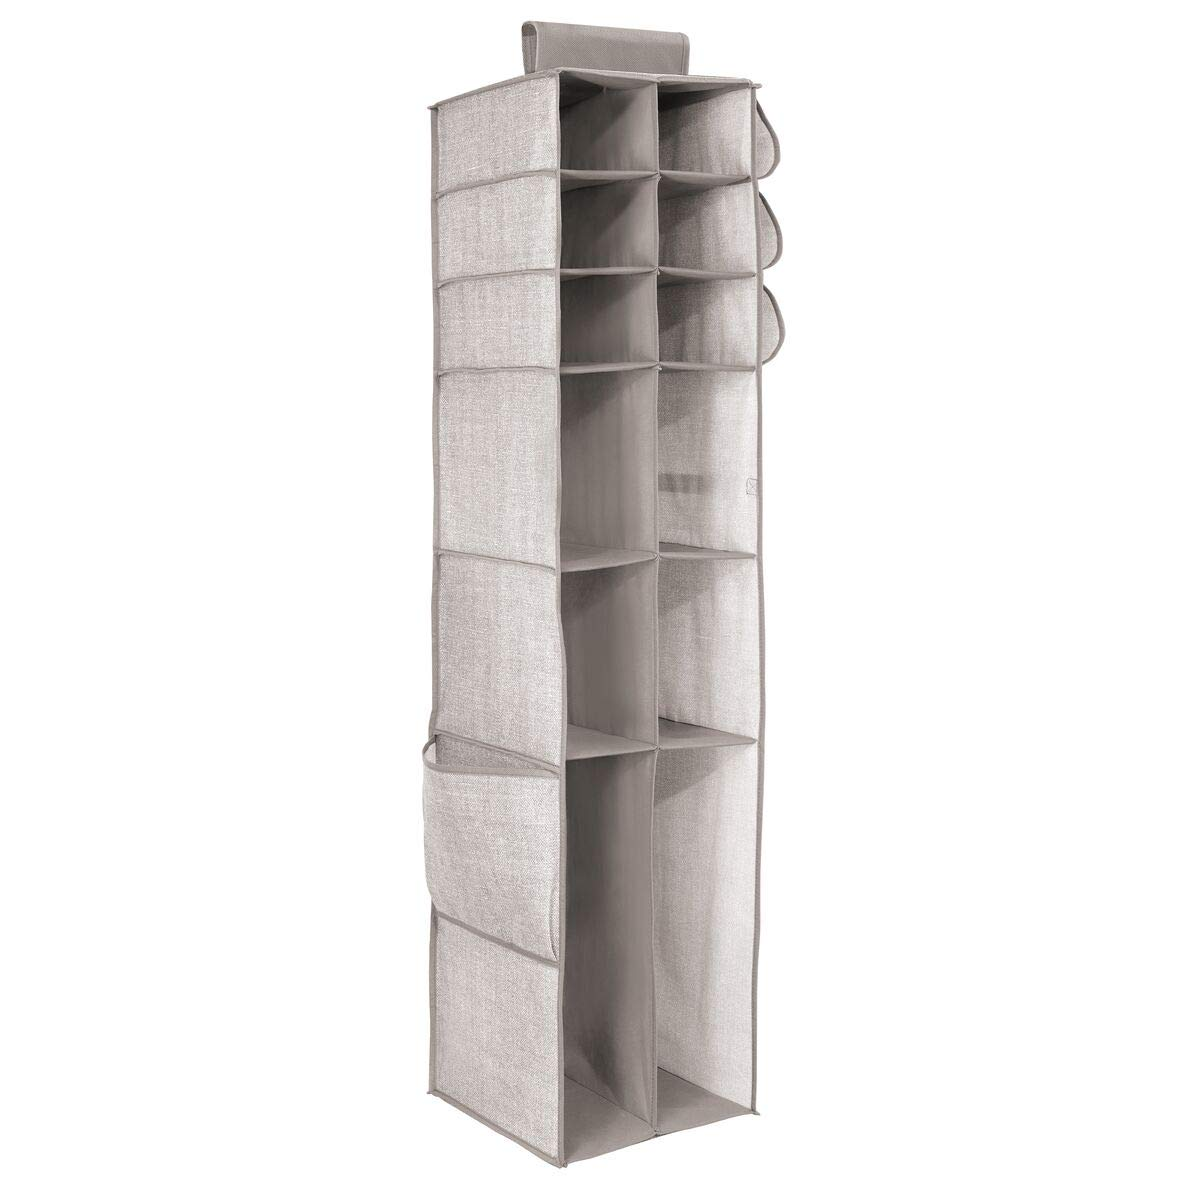 iDesign InterDesign 16-Shelf and Pocket Chevron Linen Aldo Boot & Accessory Organizer